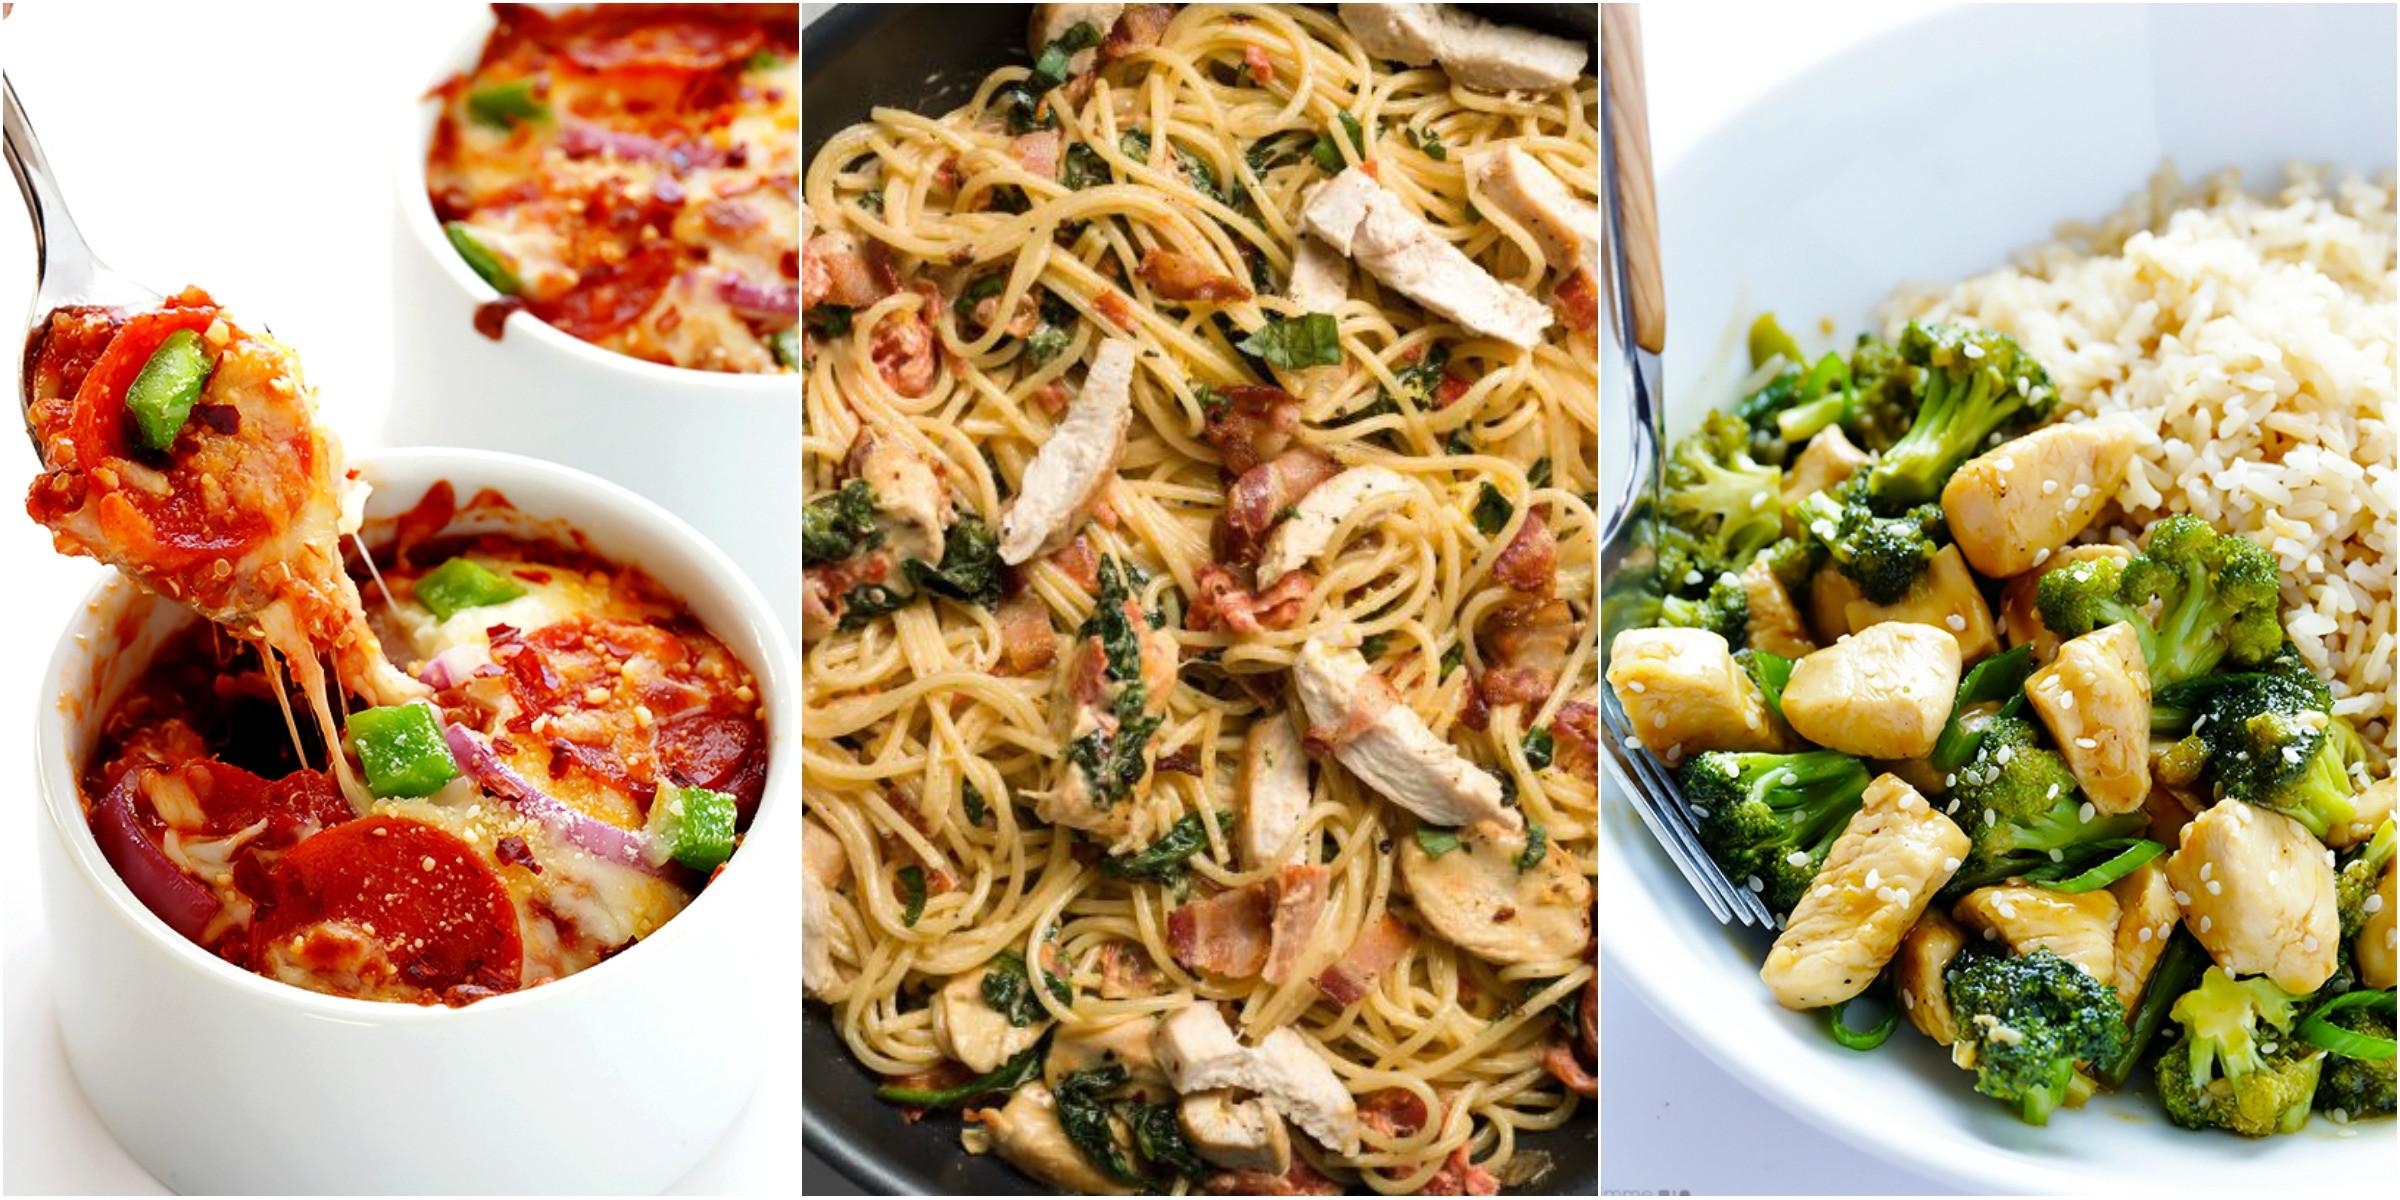 Quick Easy Dinner  20 Quick & Easy Dinner Ideas Recipes for Fast Family